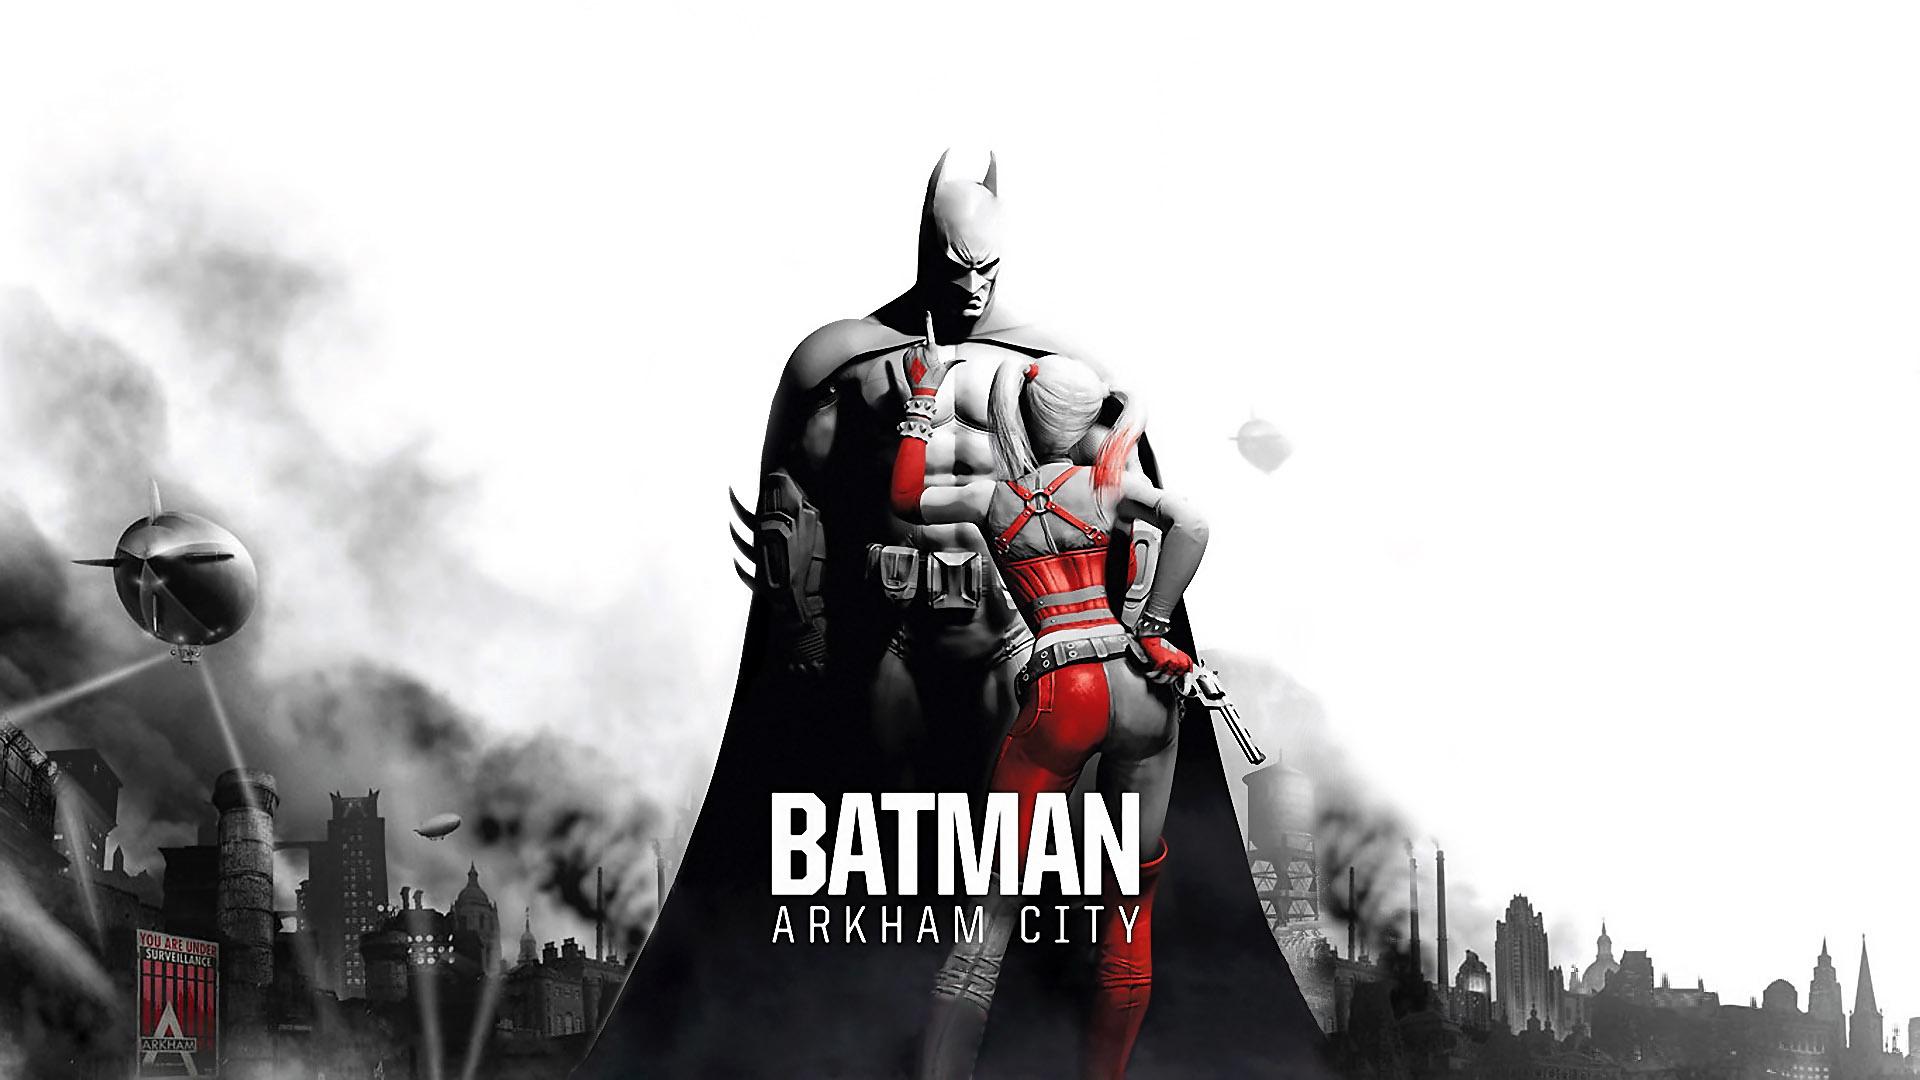 1080p Wide Screen Batman Wallpapers Wide Screen Wallpaper 1080p2k4k